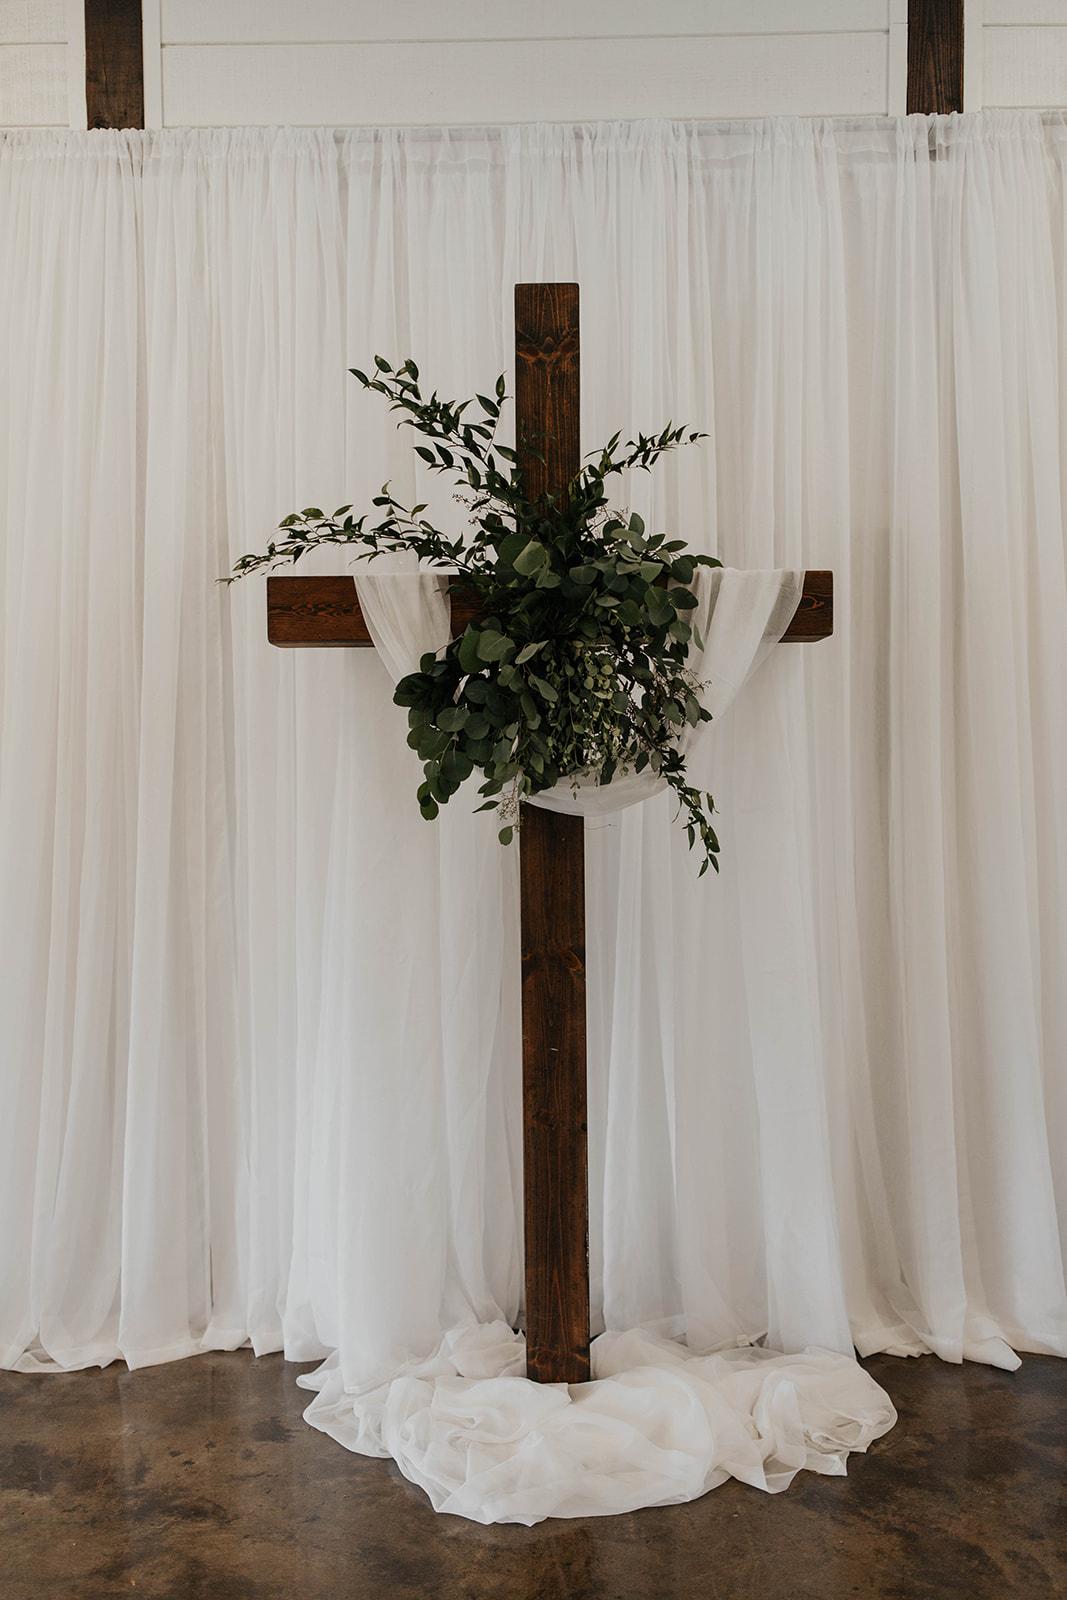 Tulsa Bixby Oklahoma Best Wedding and Reception Venue 3.jpg